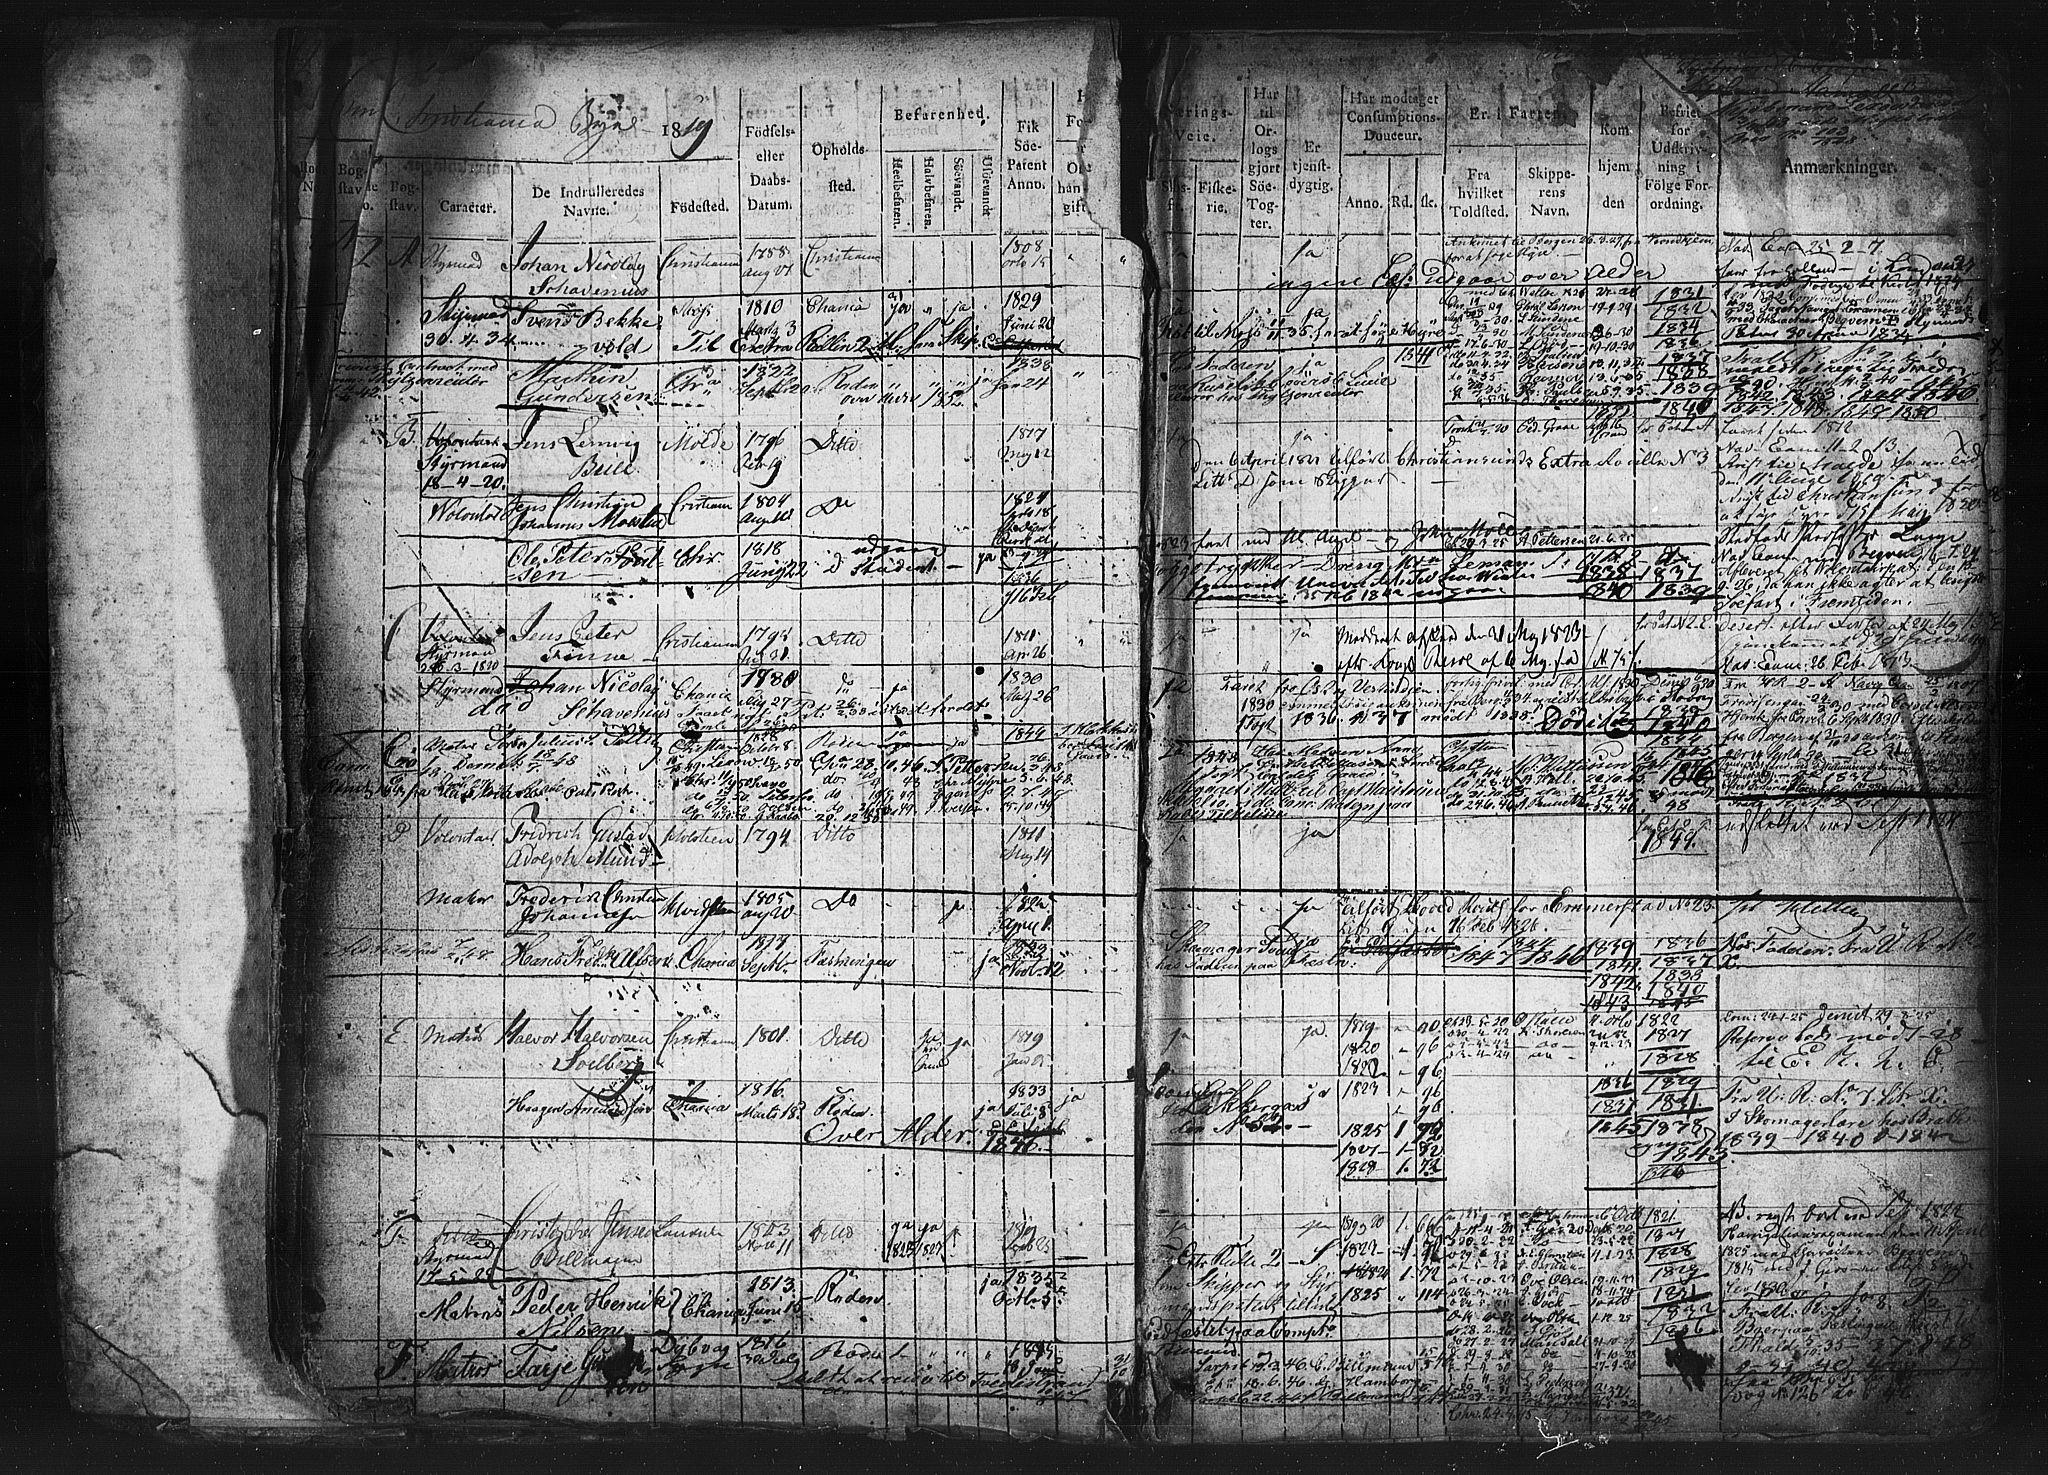 SAO, Oslo mønstringskontor, F/Fc/Fcb/L0001: Hovedrulle, 1819, s. 13